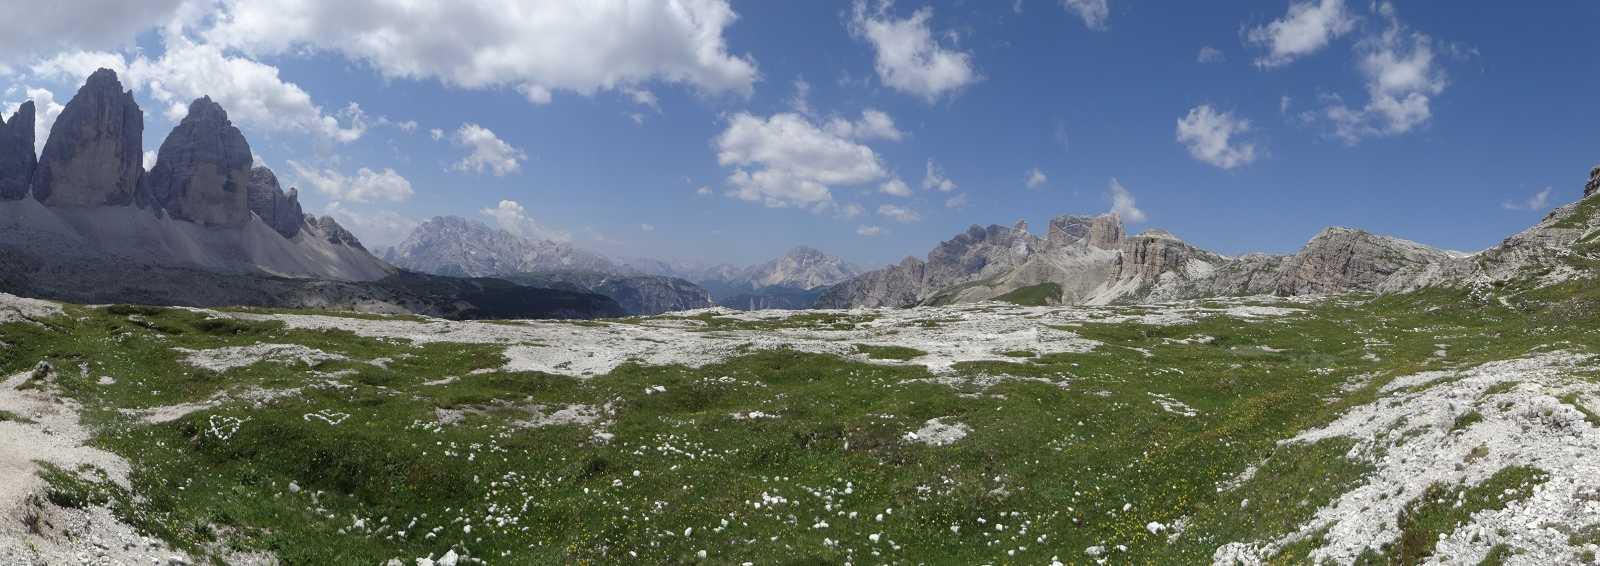 Tre Cime di Lavaredo, Dolomites, Italy